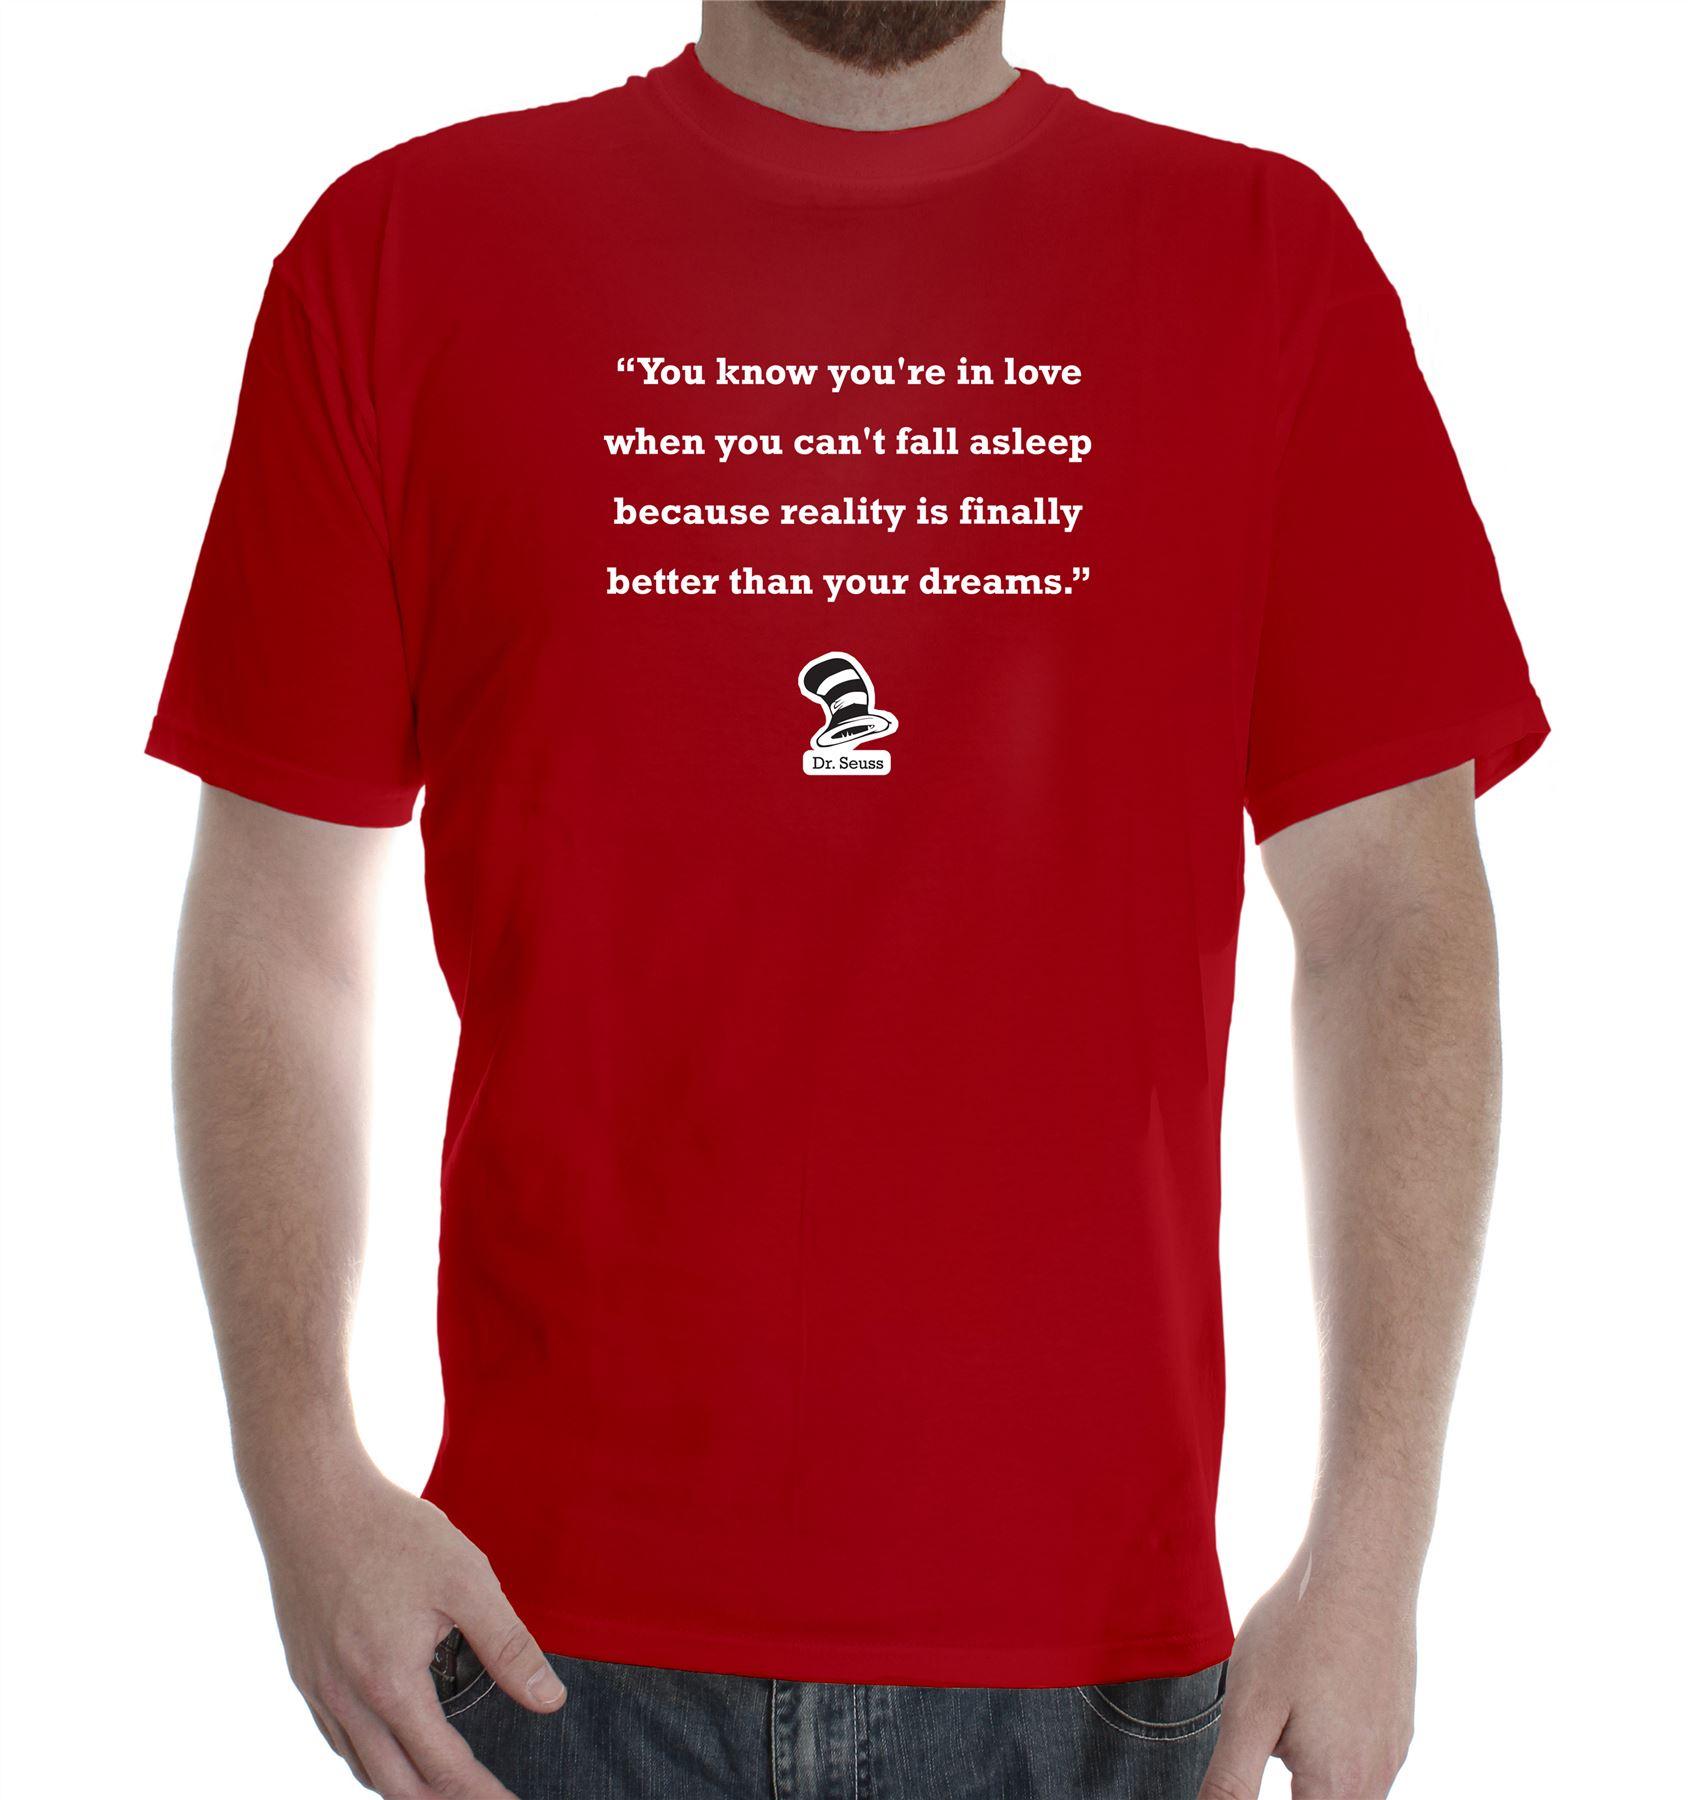 T shirt design red - Mens Printed Cotton T Shirt Tee Shirt Design